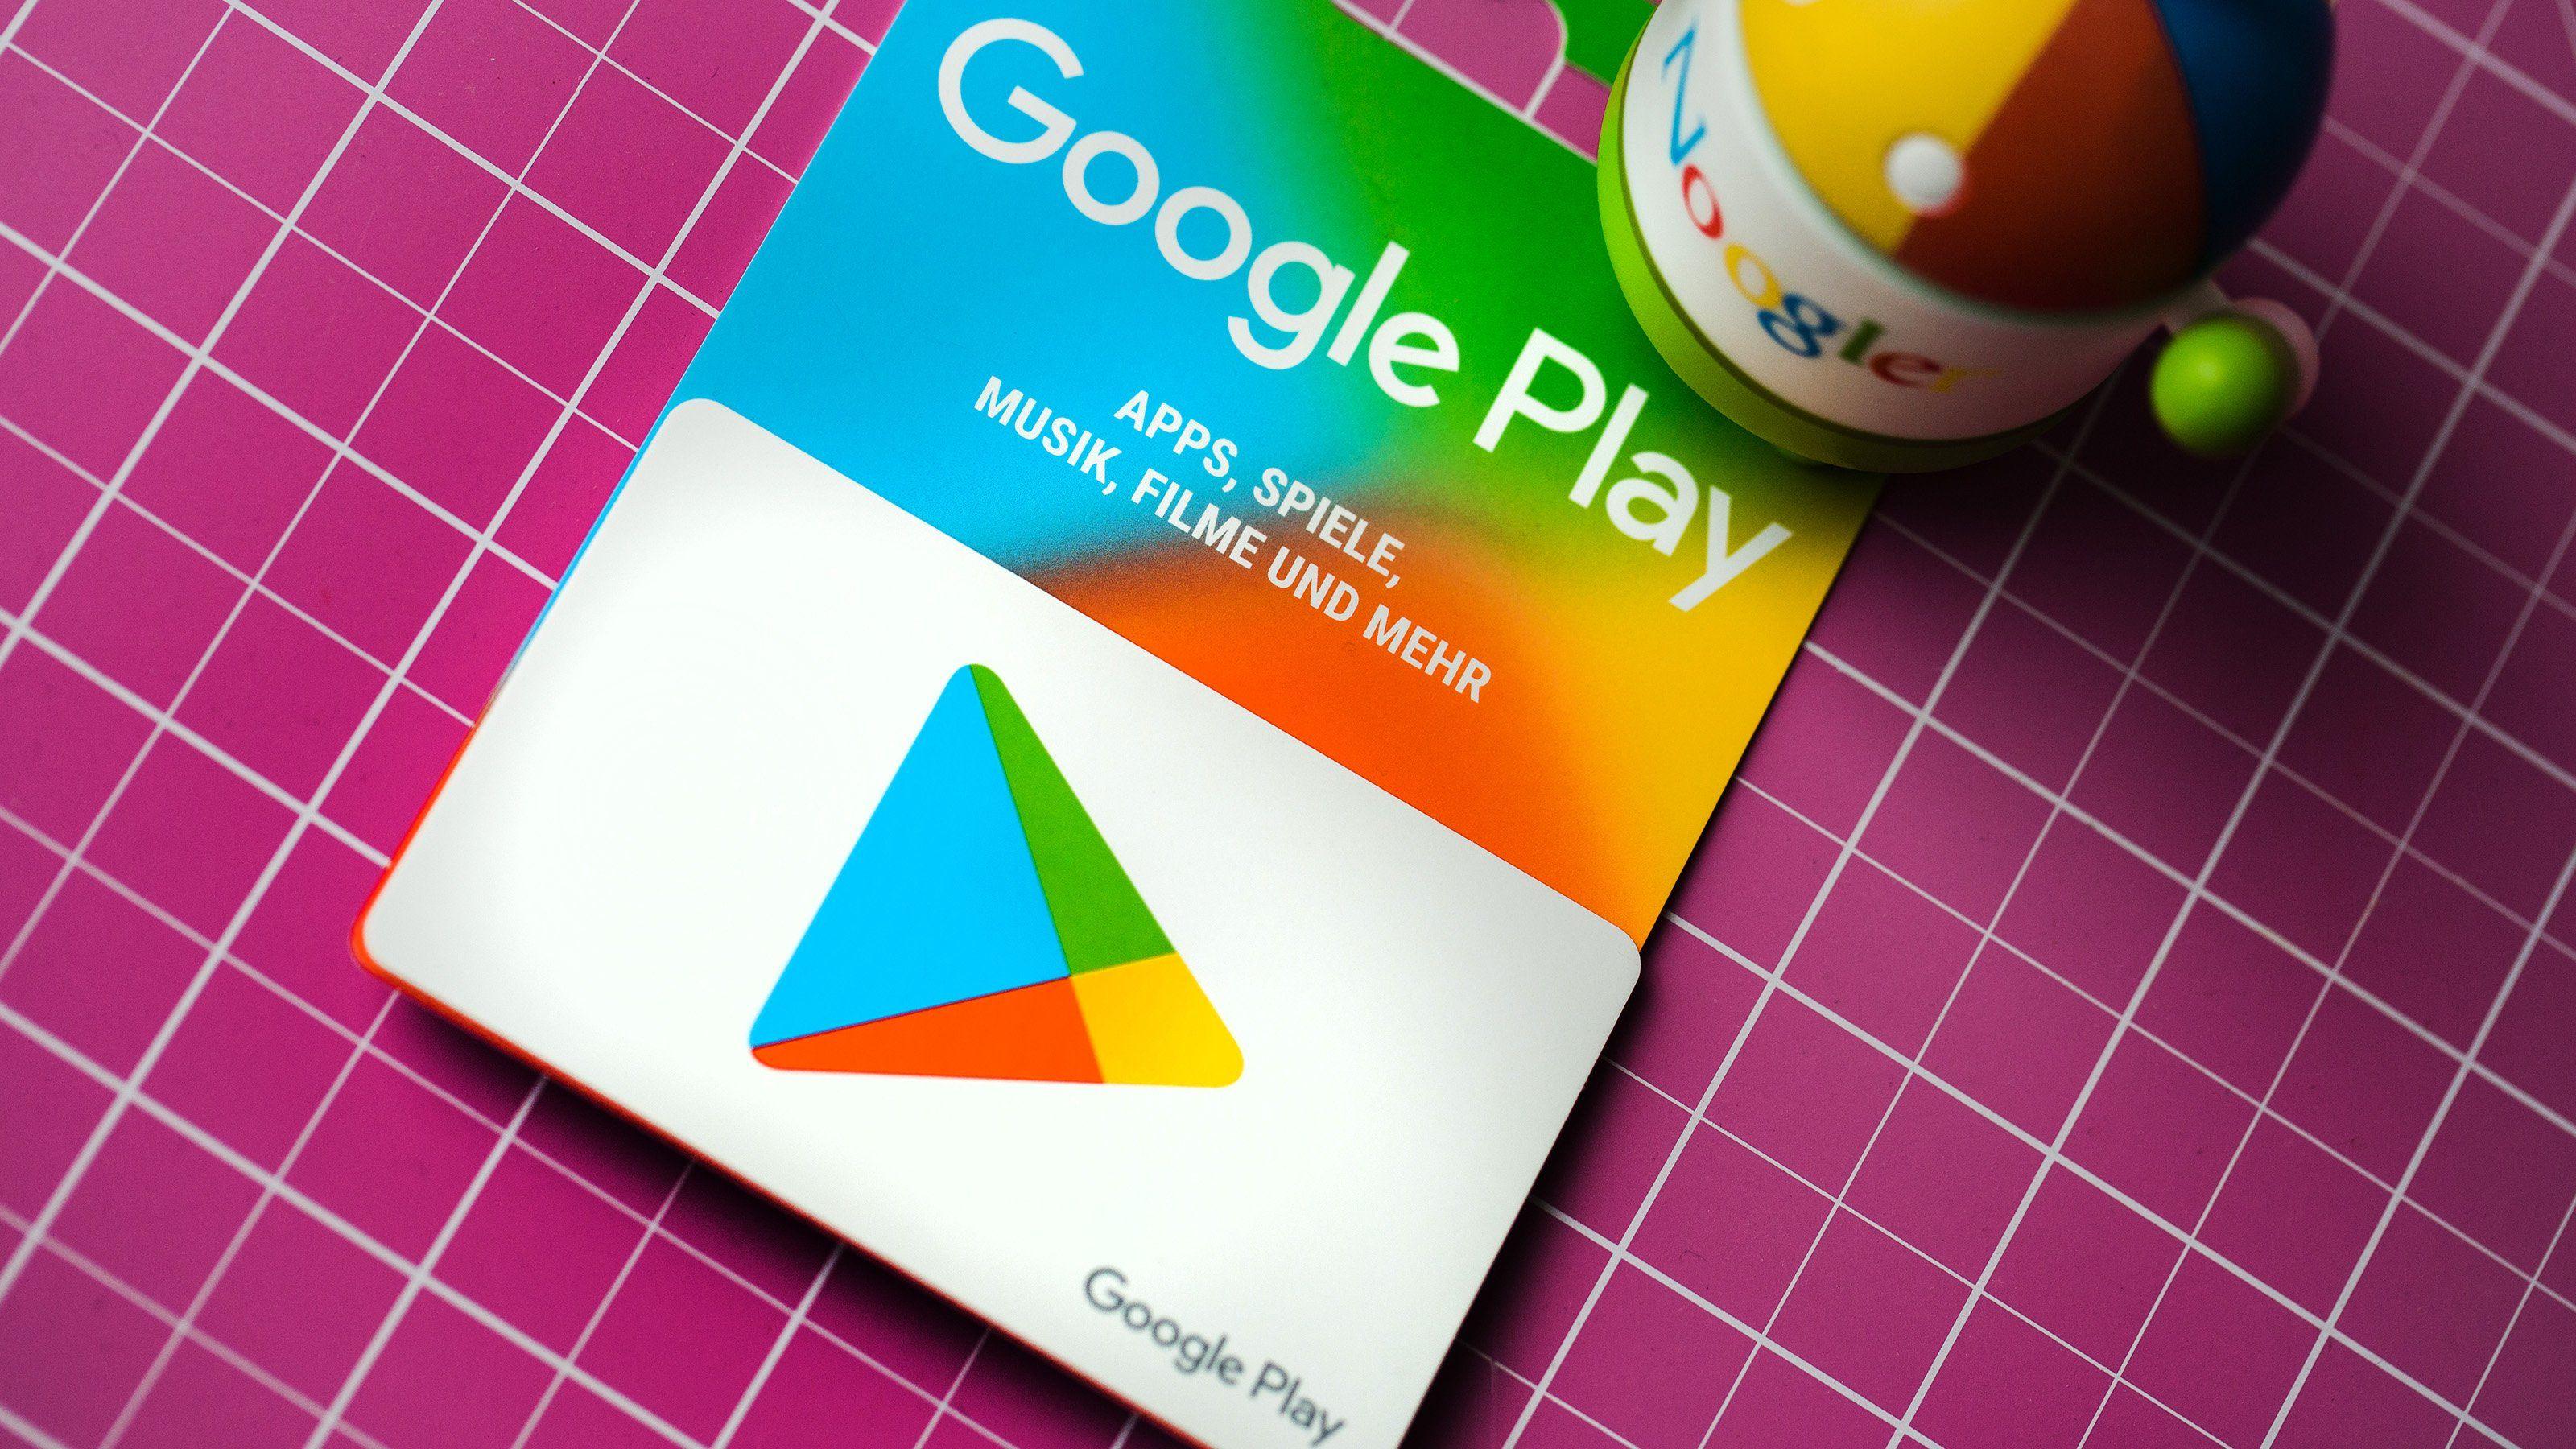 Google Play Store Funktioniert Nicht Das Hilft Gegen Probleme Google Play Apps Fur Android Apps